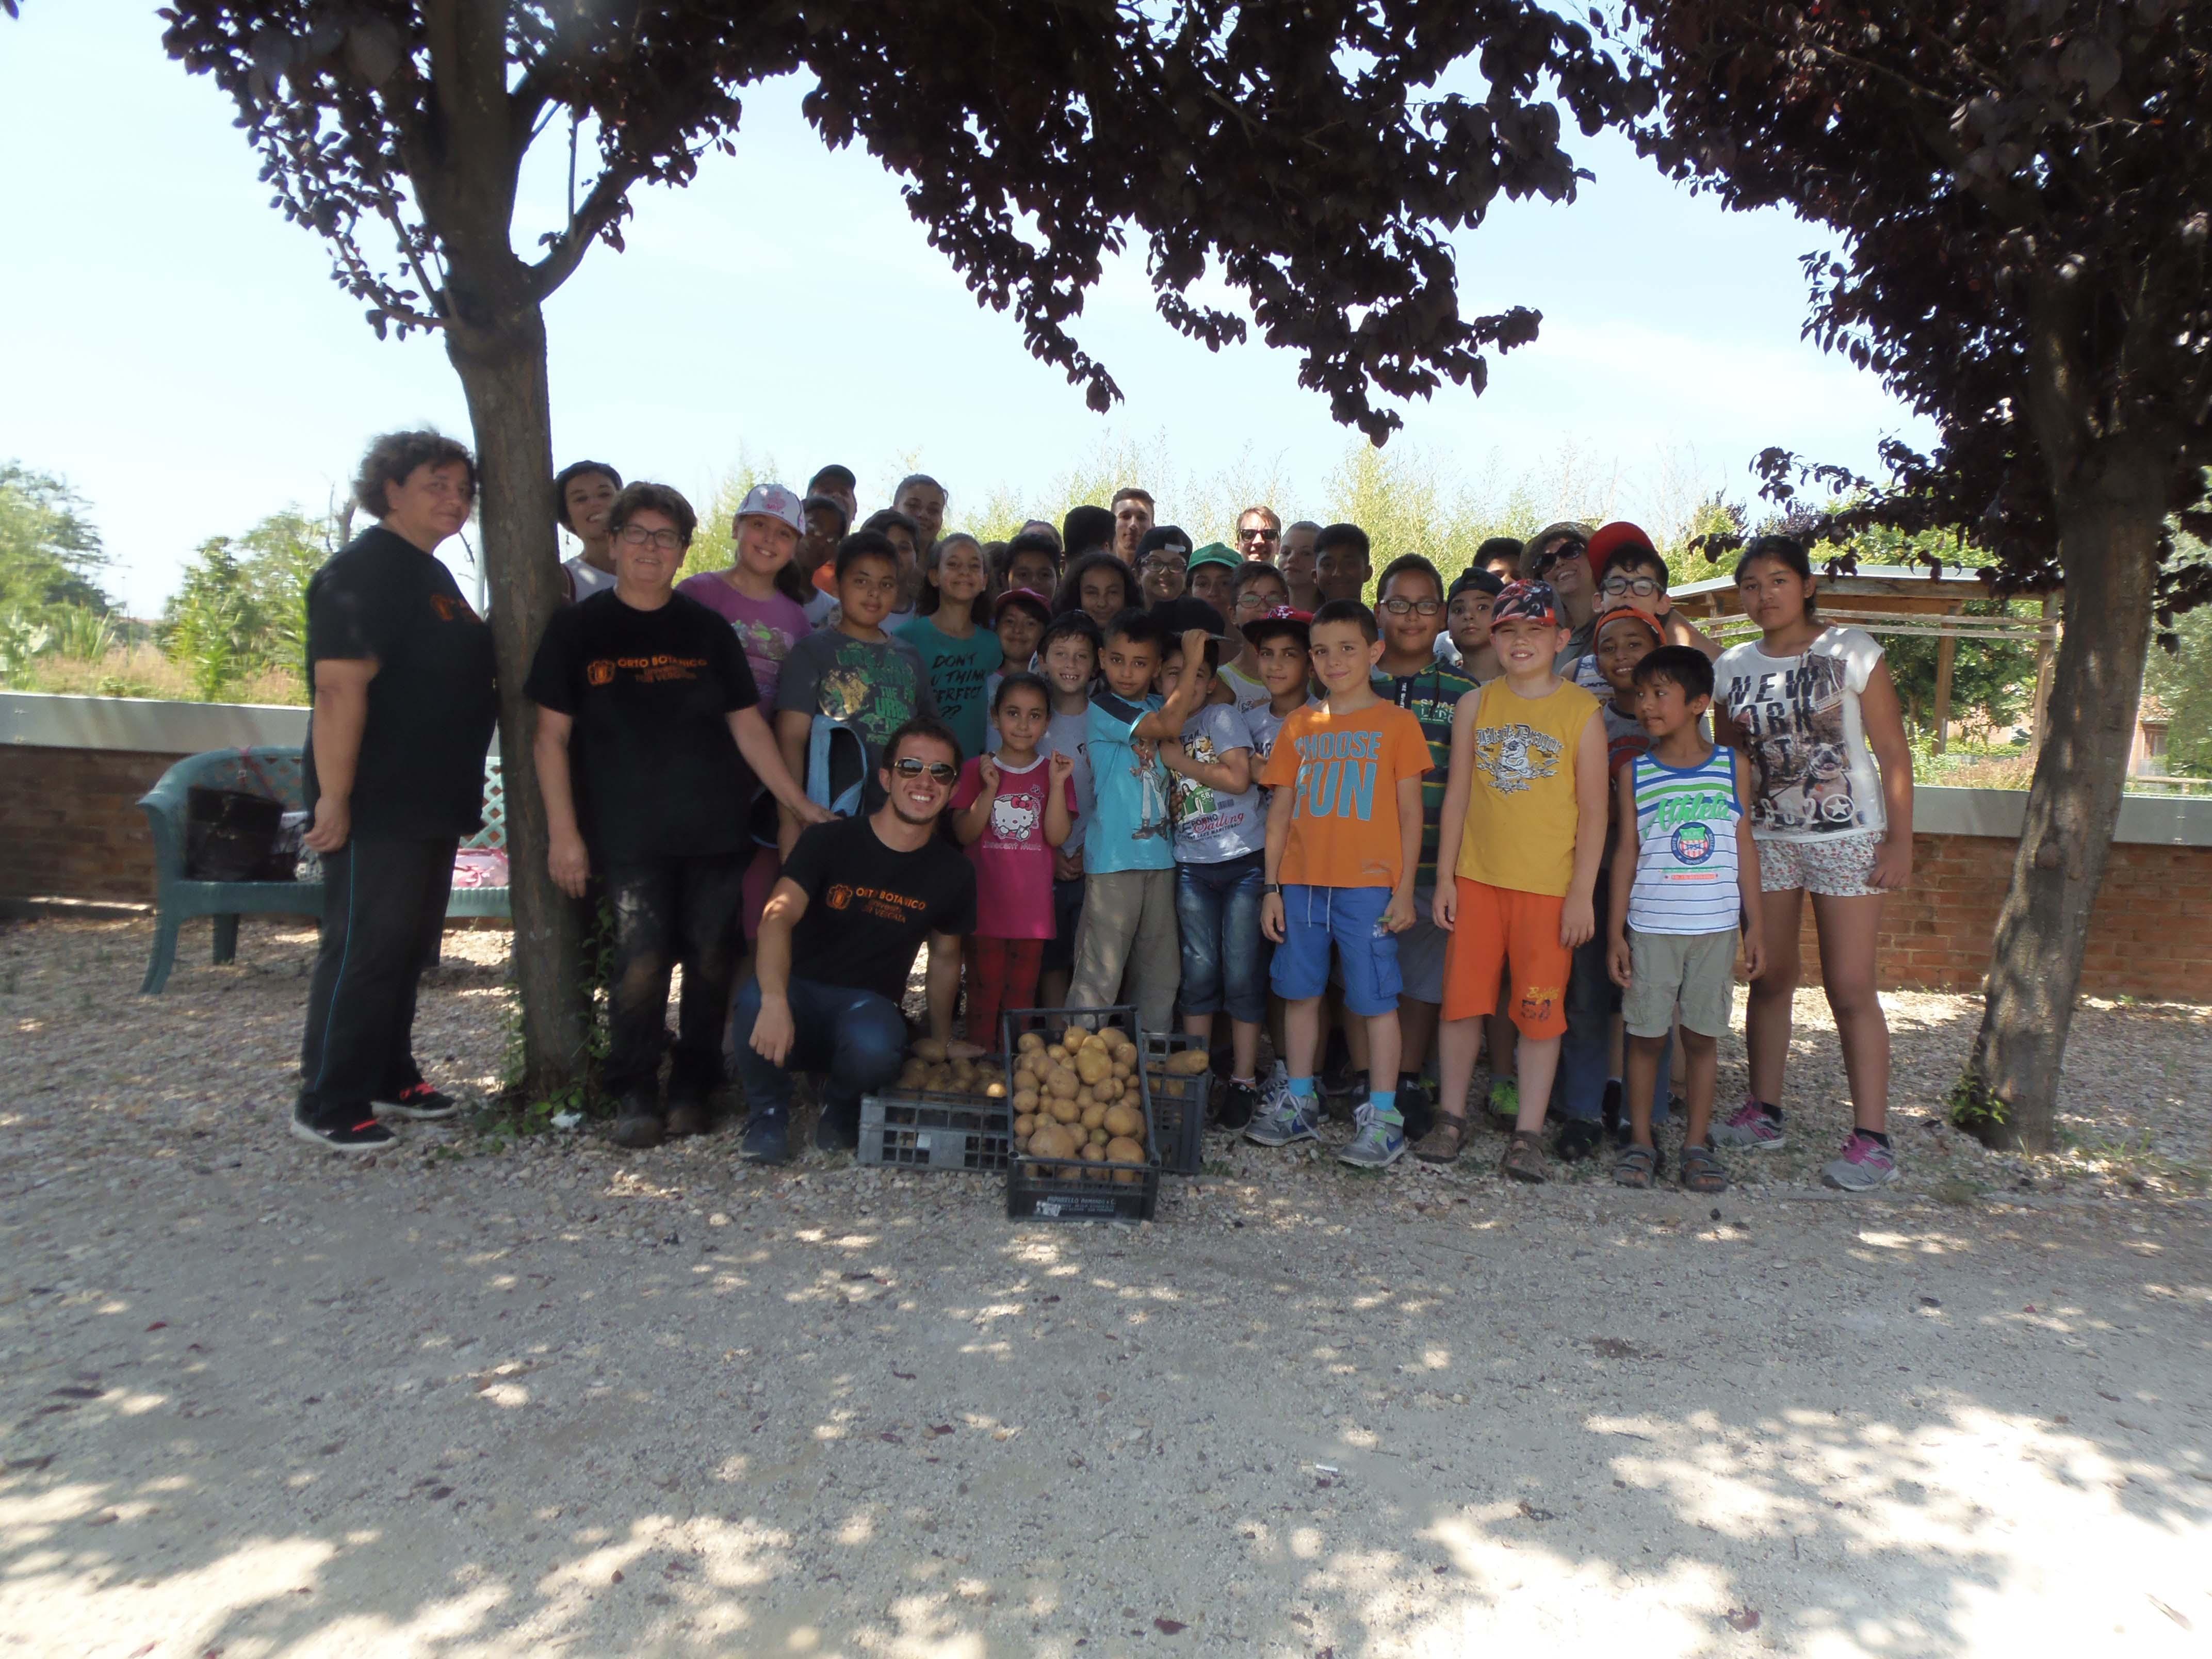 L'educazione è un bene di tutti: L'Orto Botanico insieme a Save the Children.